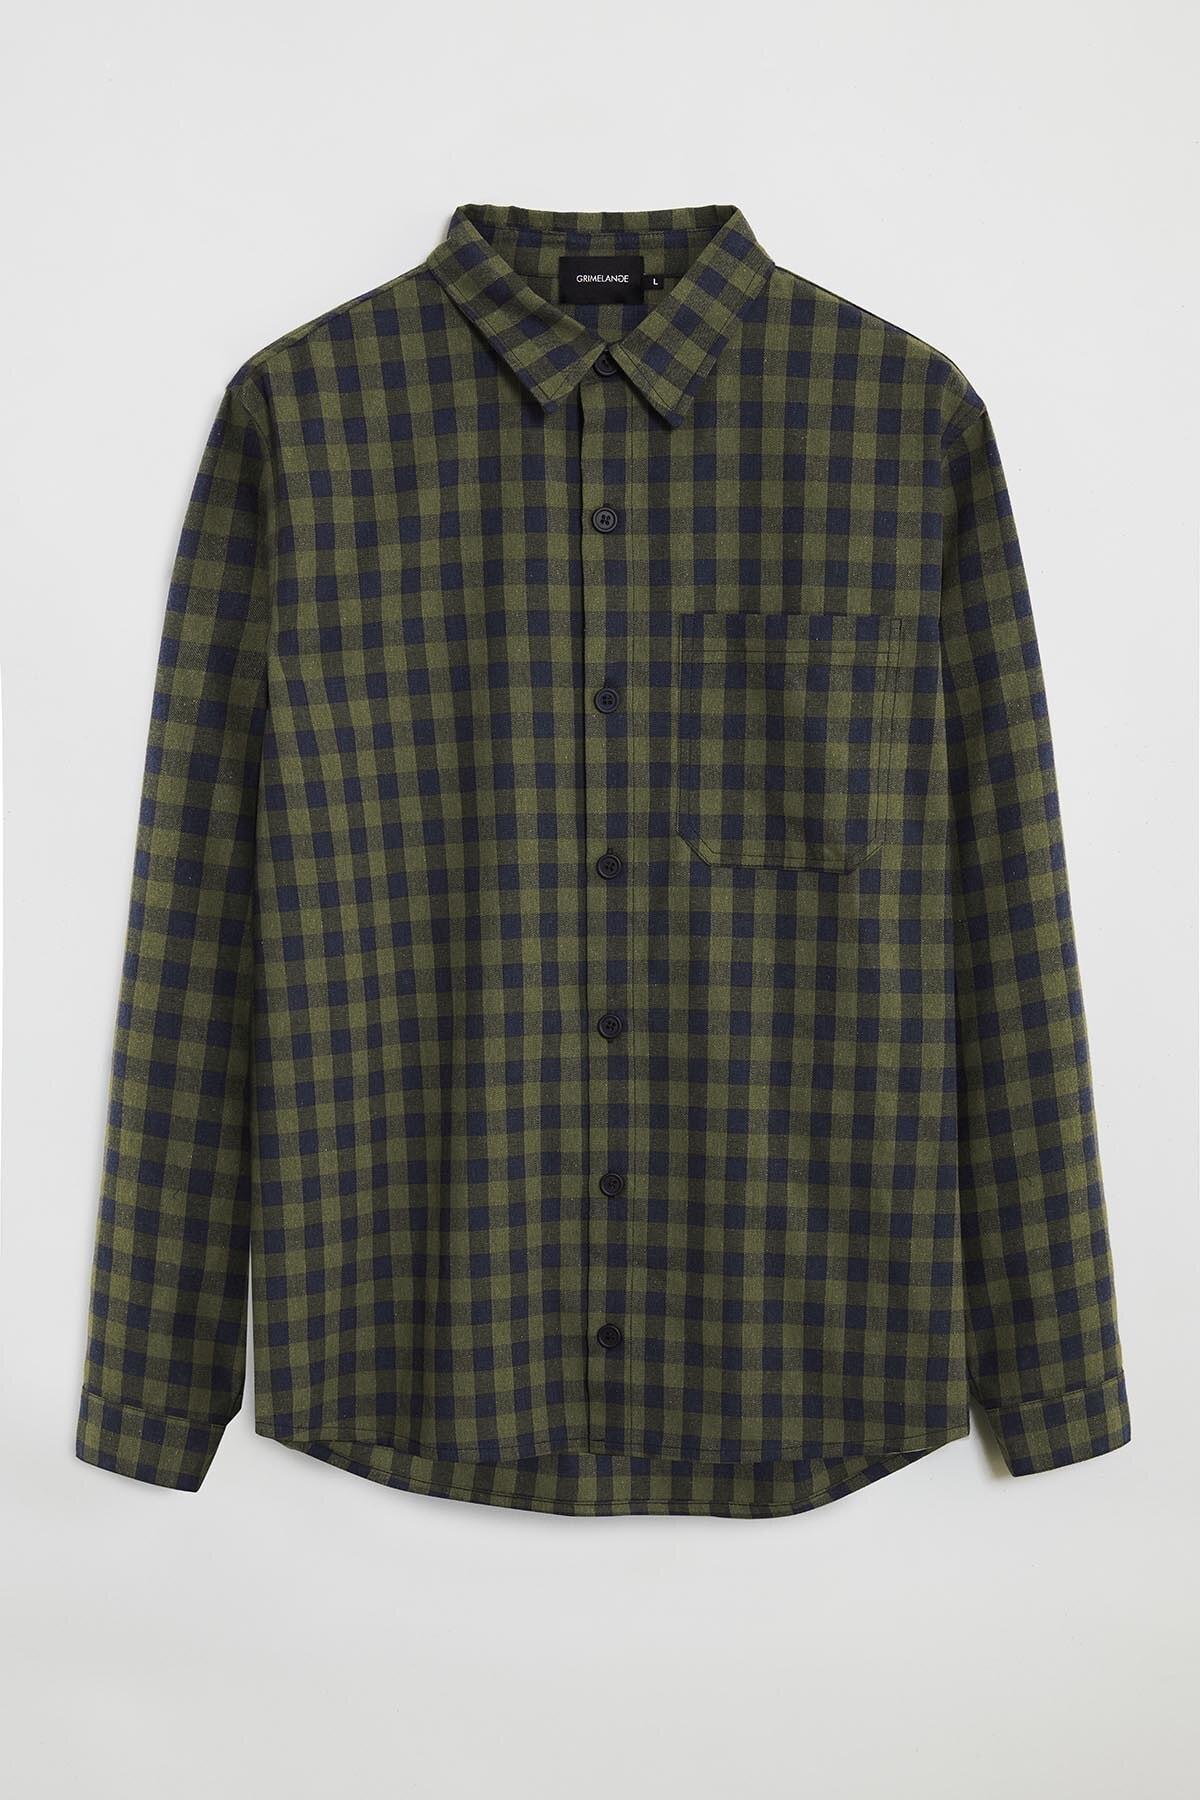 GRIMELANGE BRETT Erkek Yeşil Kareli Regular Gömlek 0